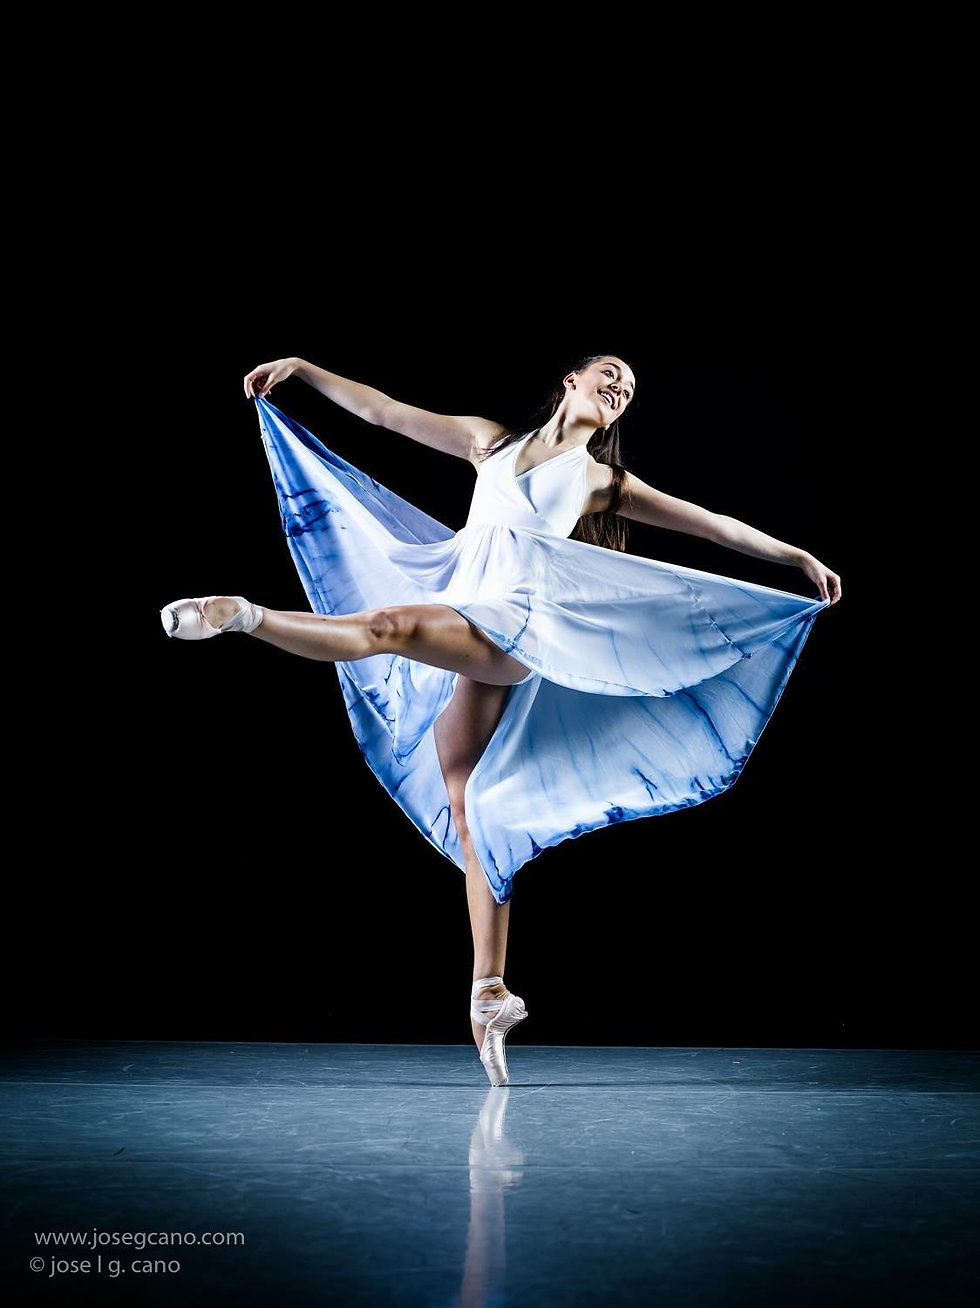 Anneliese Gilberd Academy New Zealand, dance and education, emerging artists, new zealand ballet